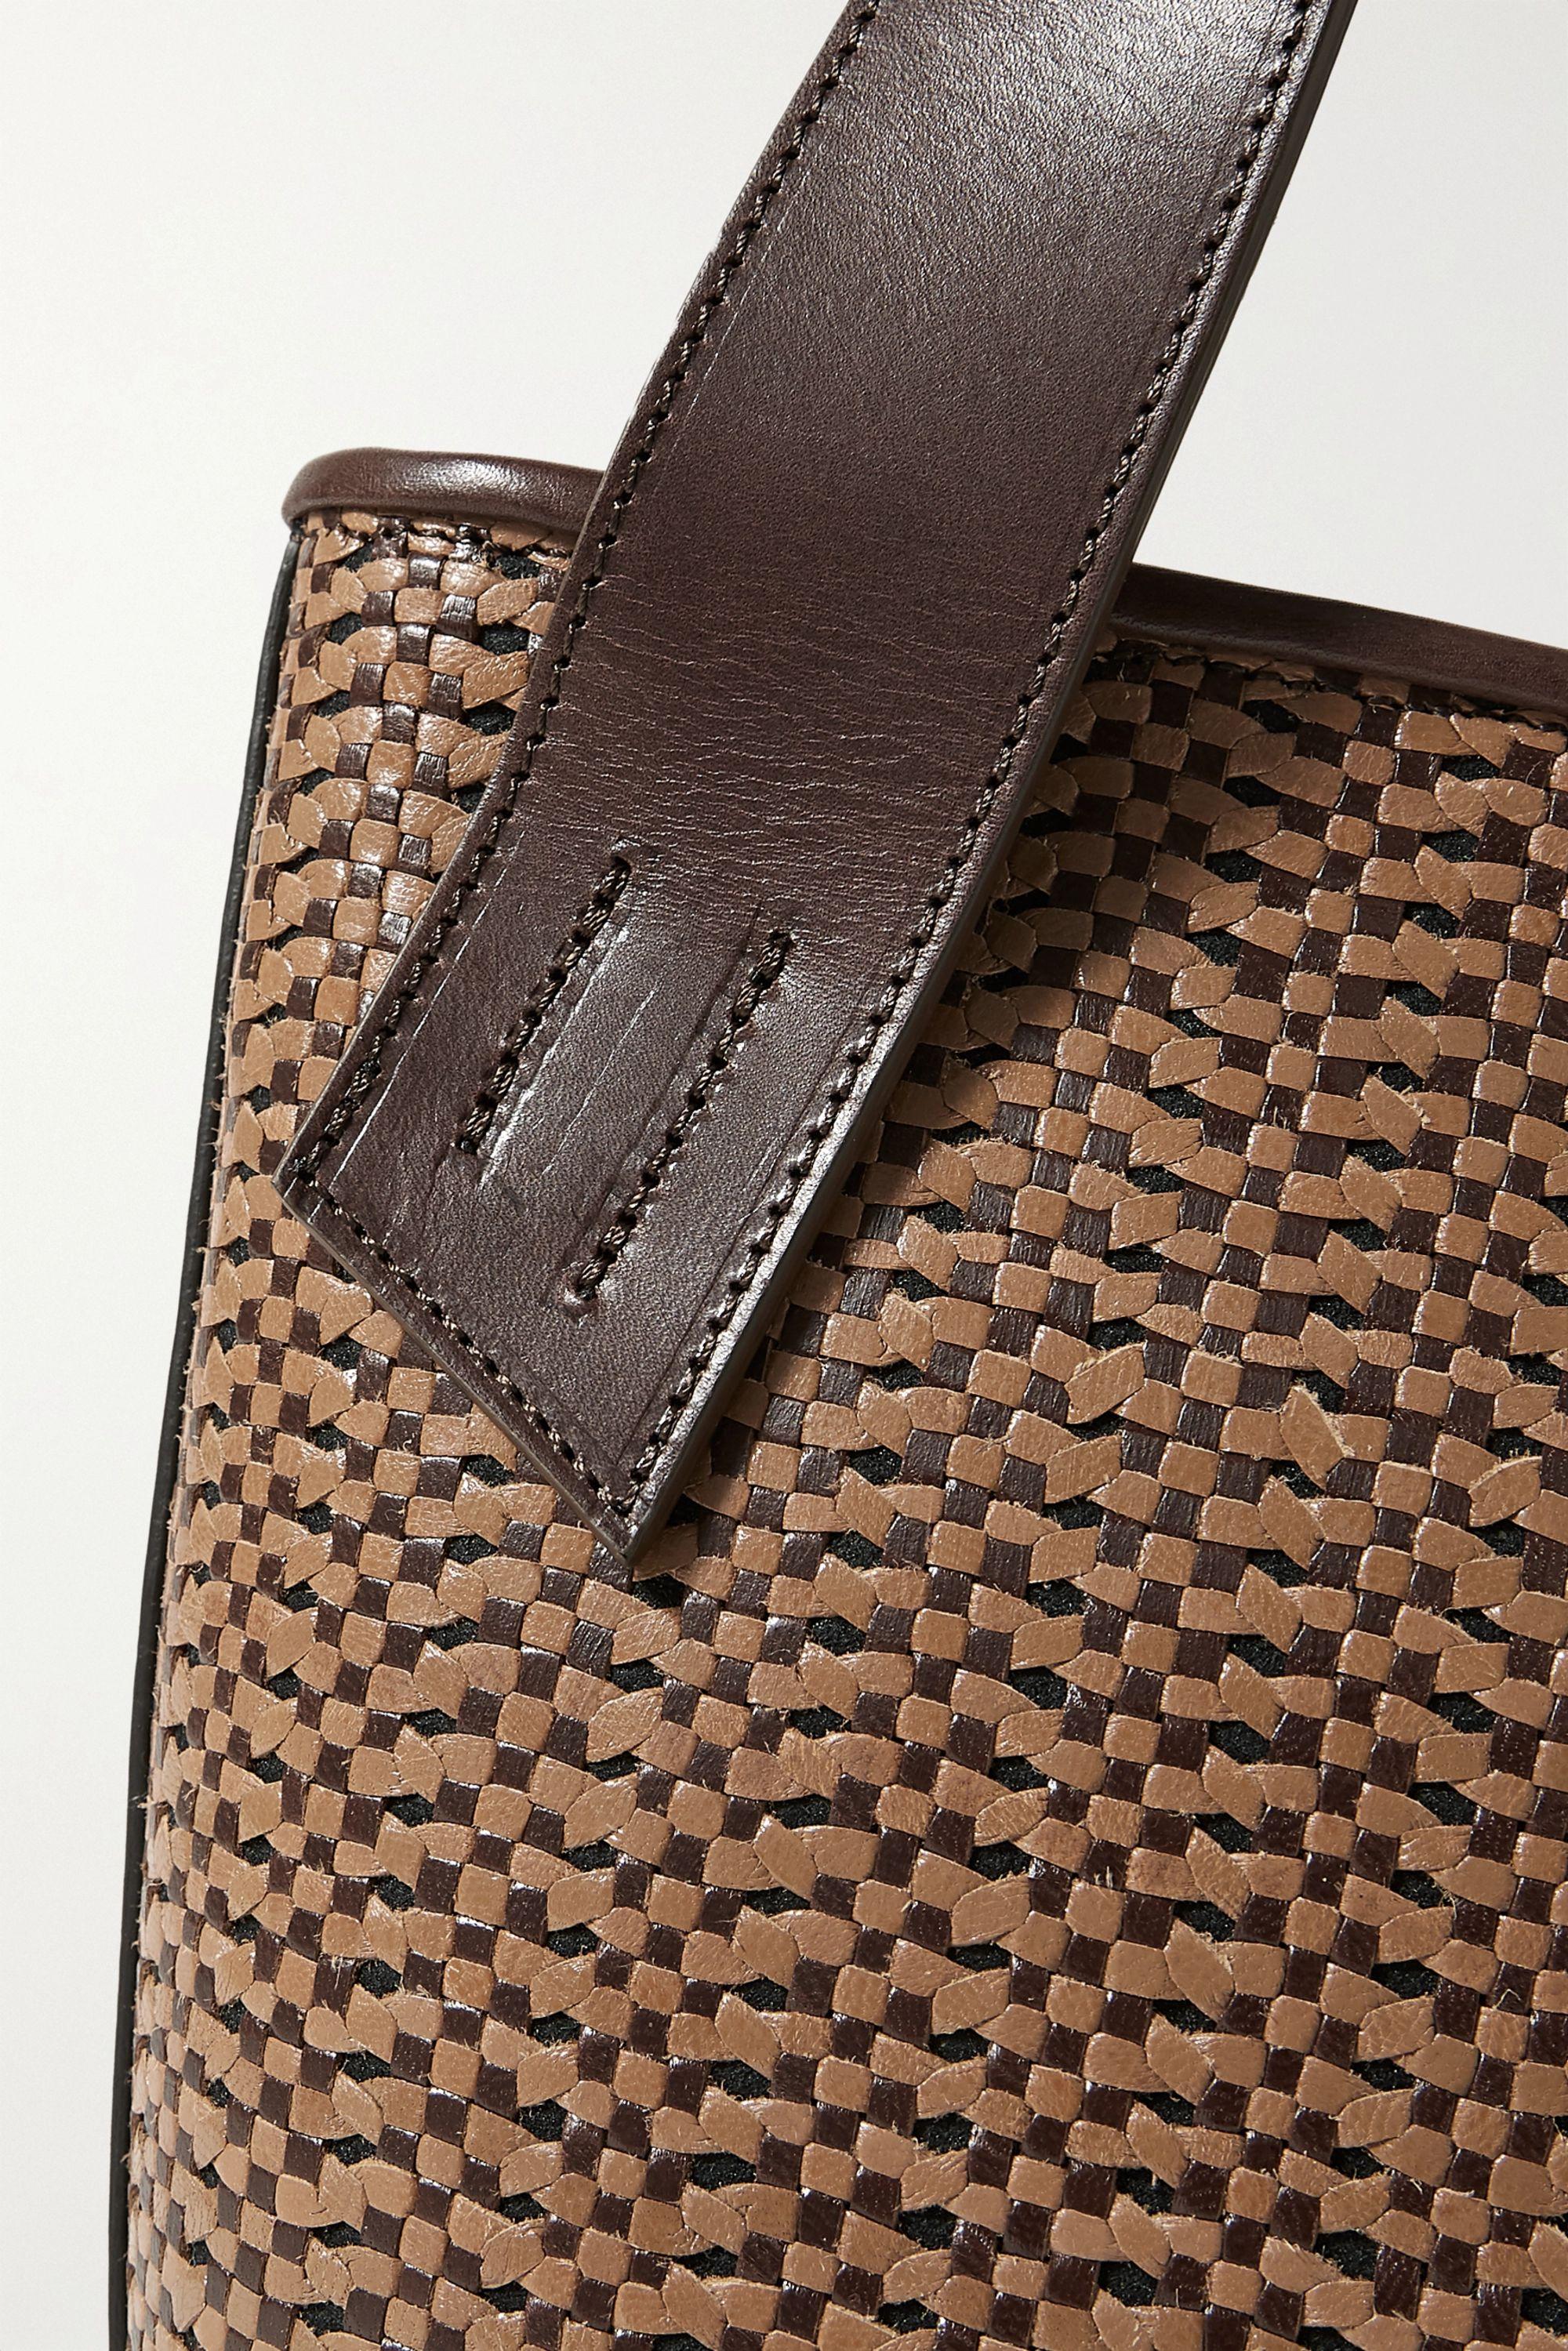 TL-180 Panier Saigon woven leather shoulder bag